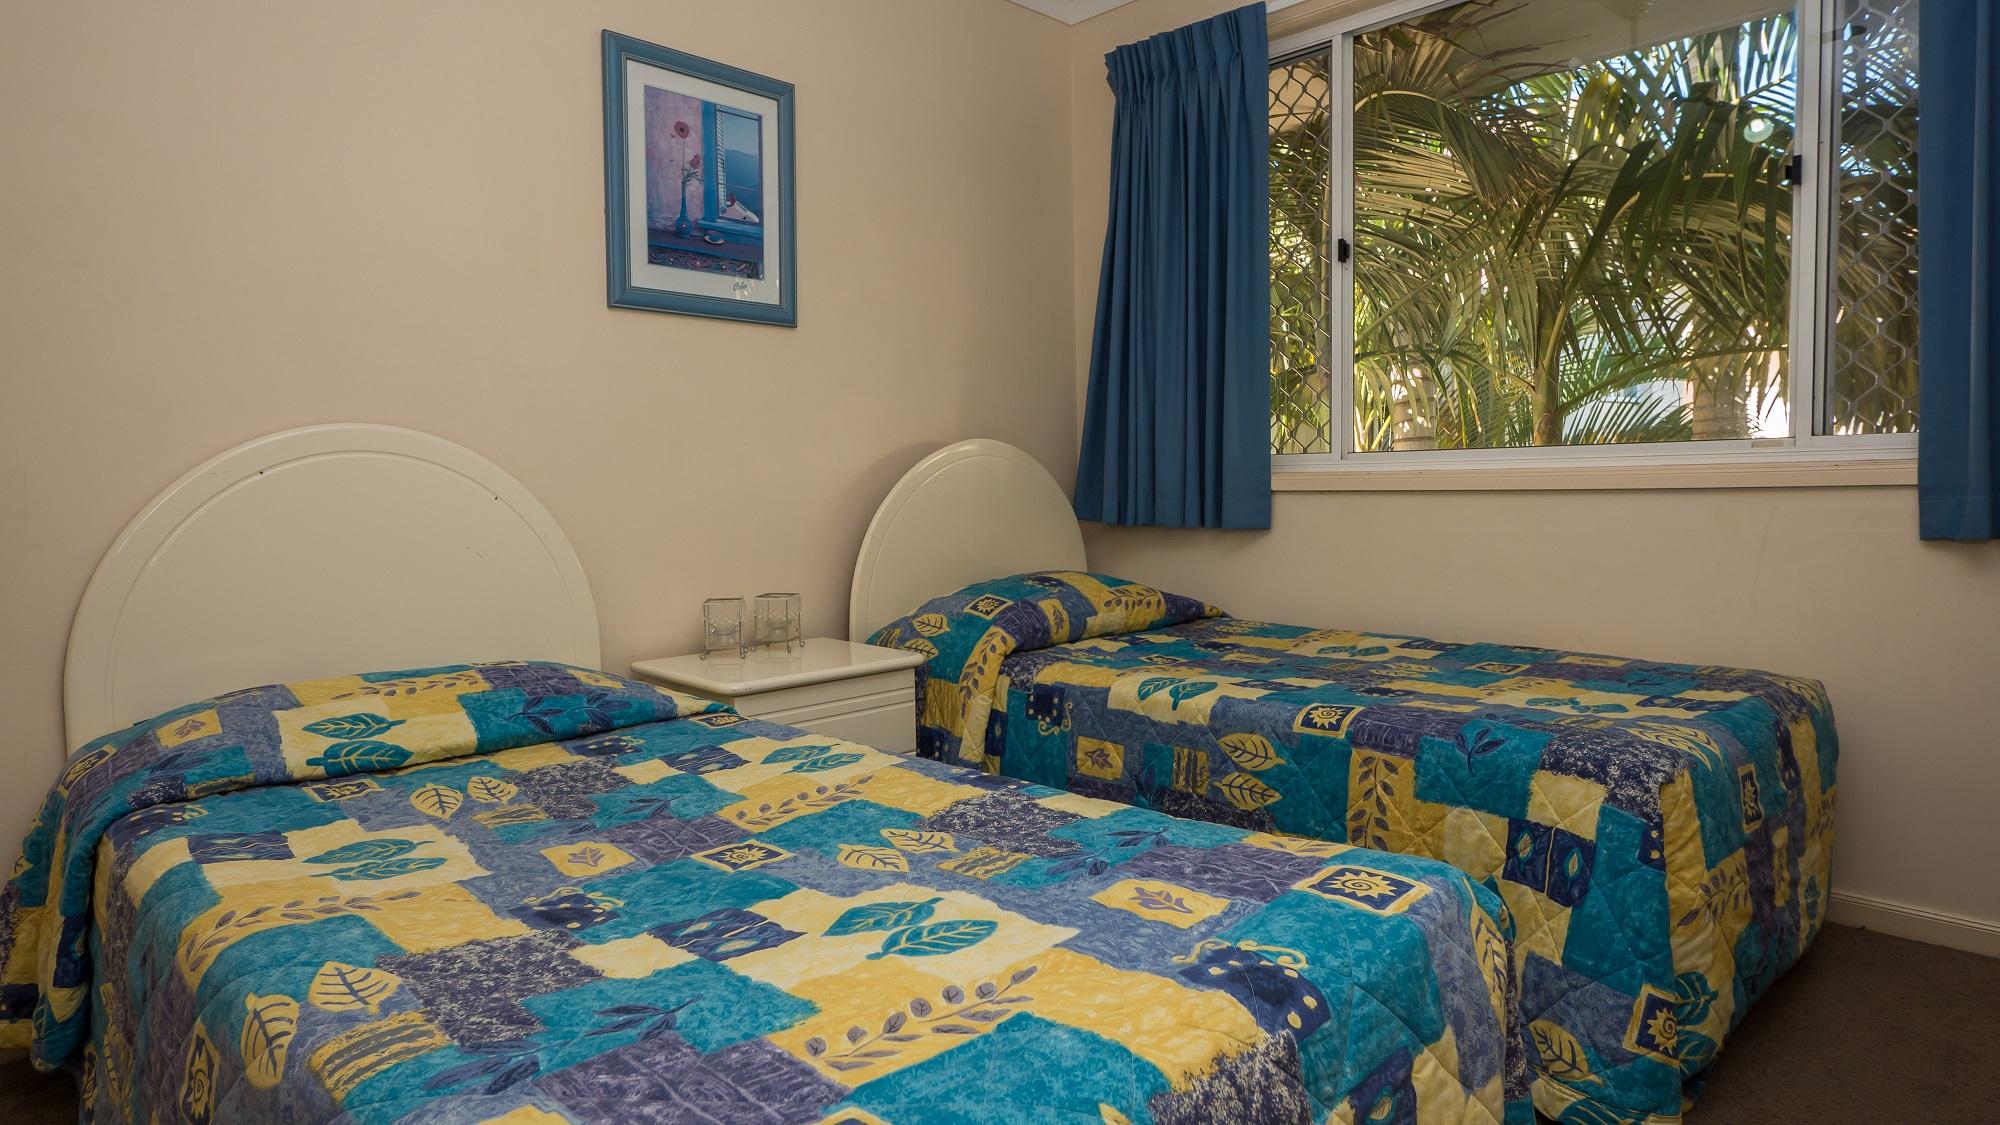 Isle of Palms Resort Accommodation - Bedroom